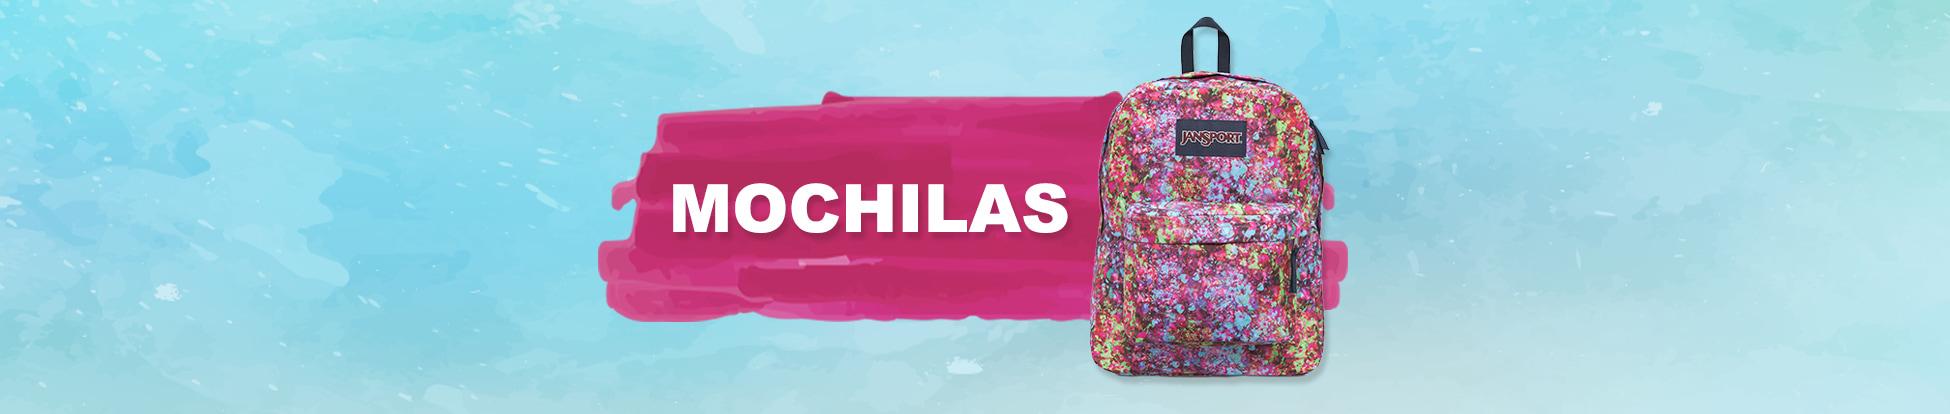 Bolsas - Mochila